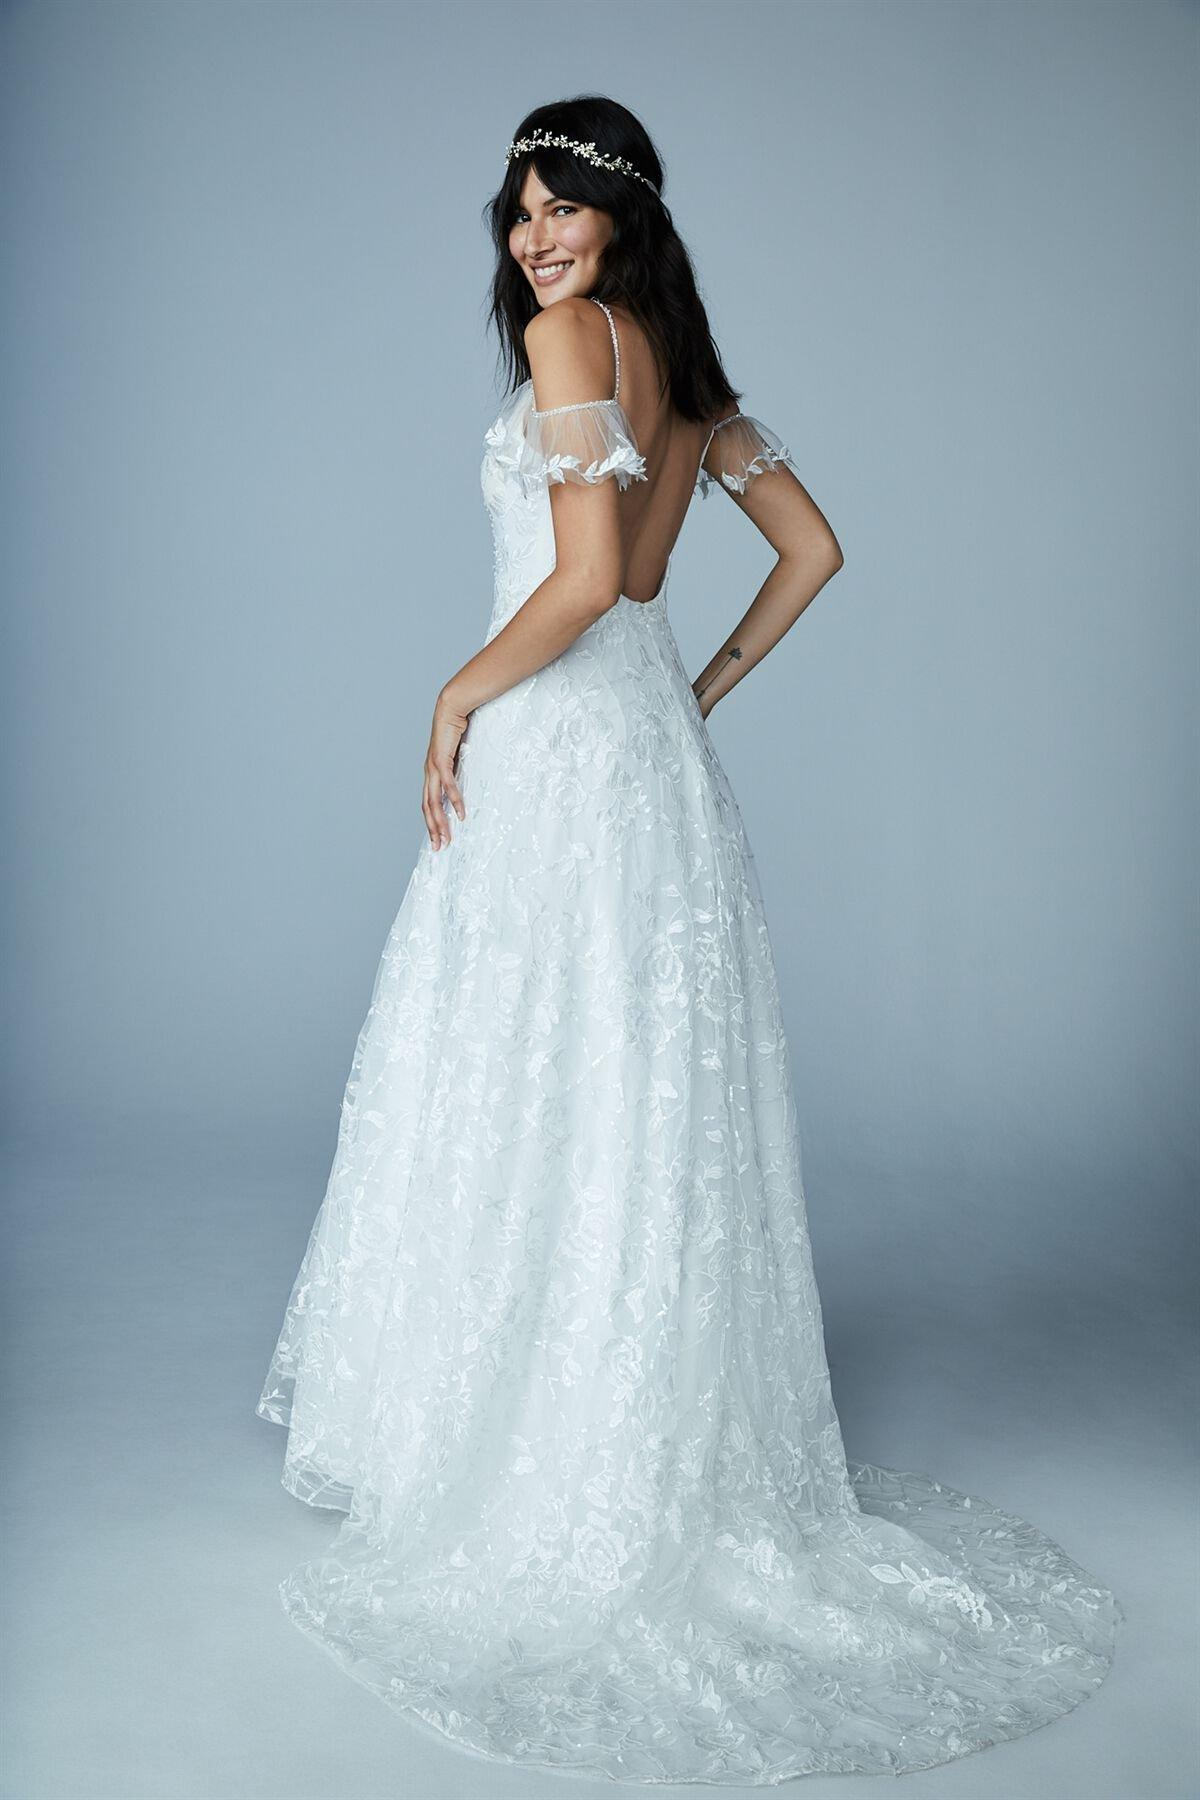 Enamored Wedding Dress